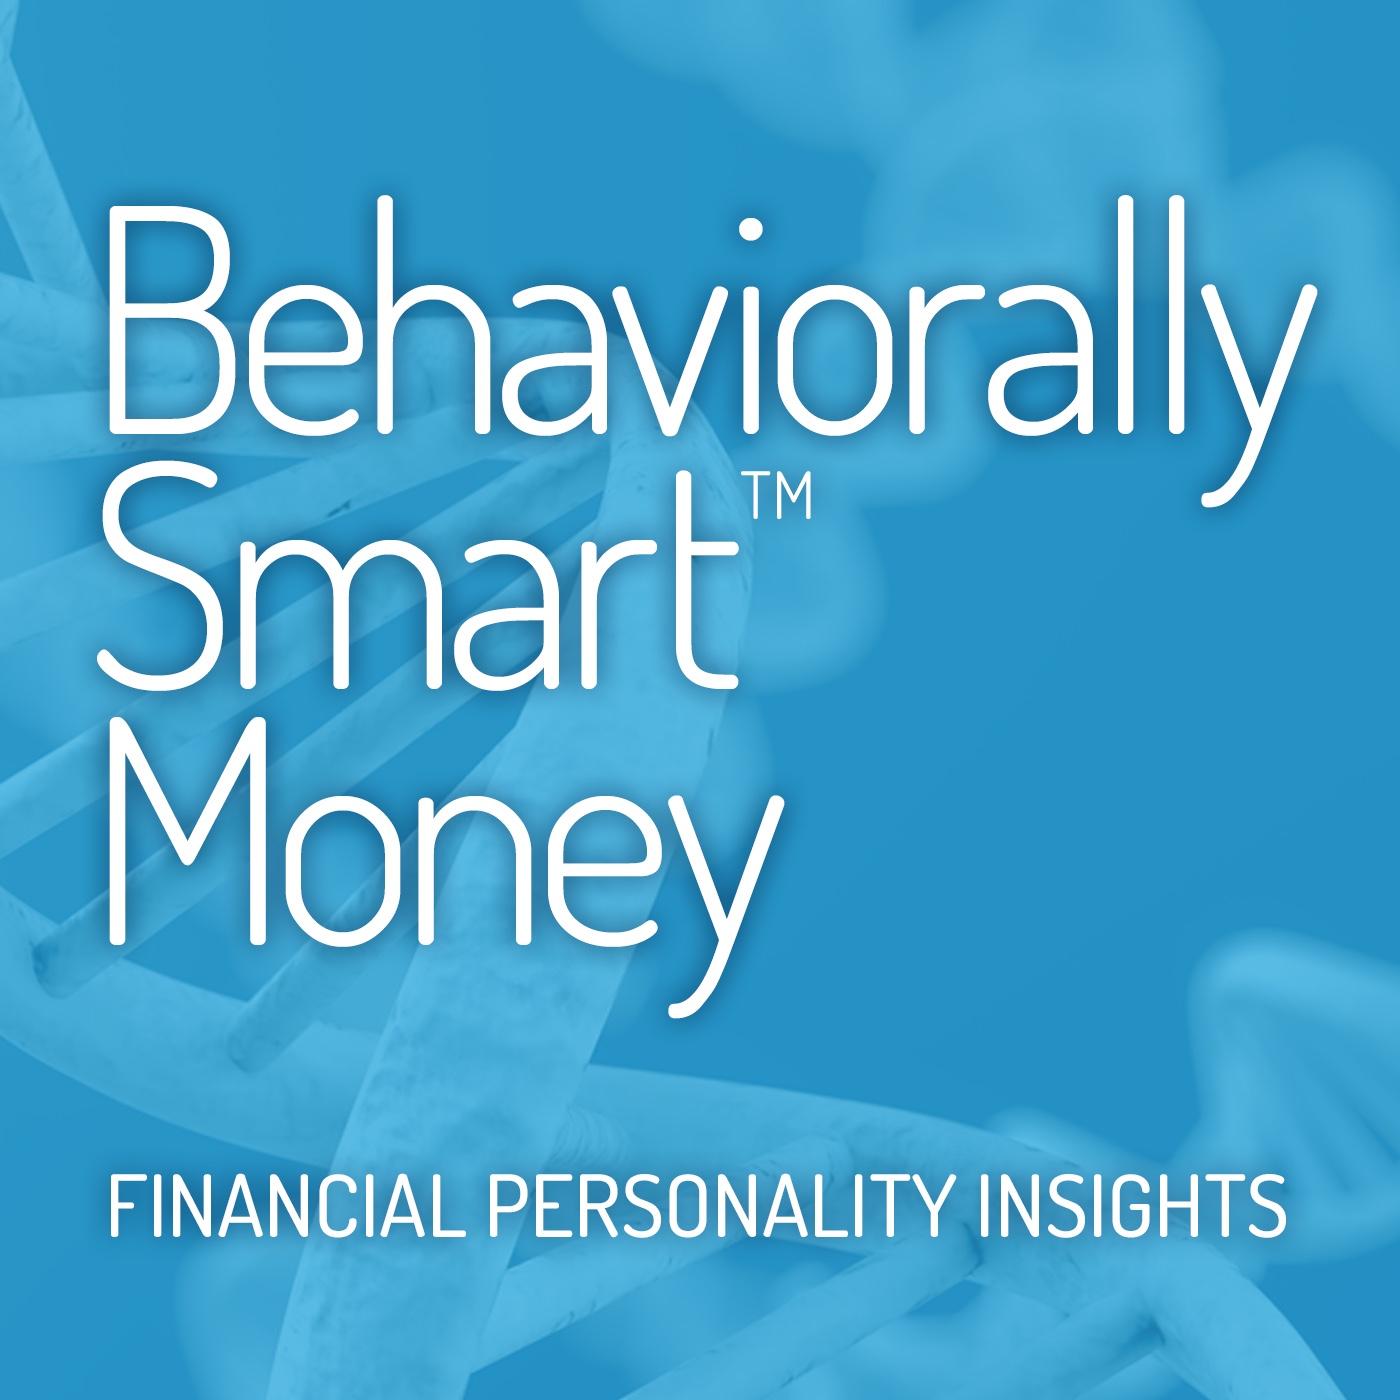 Behaviorally Smart Money logo